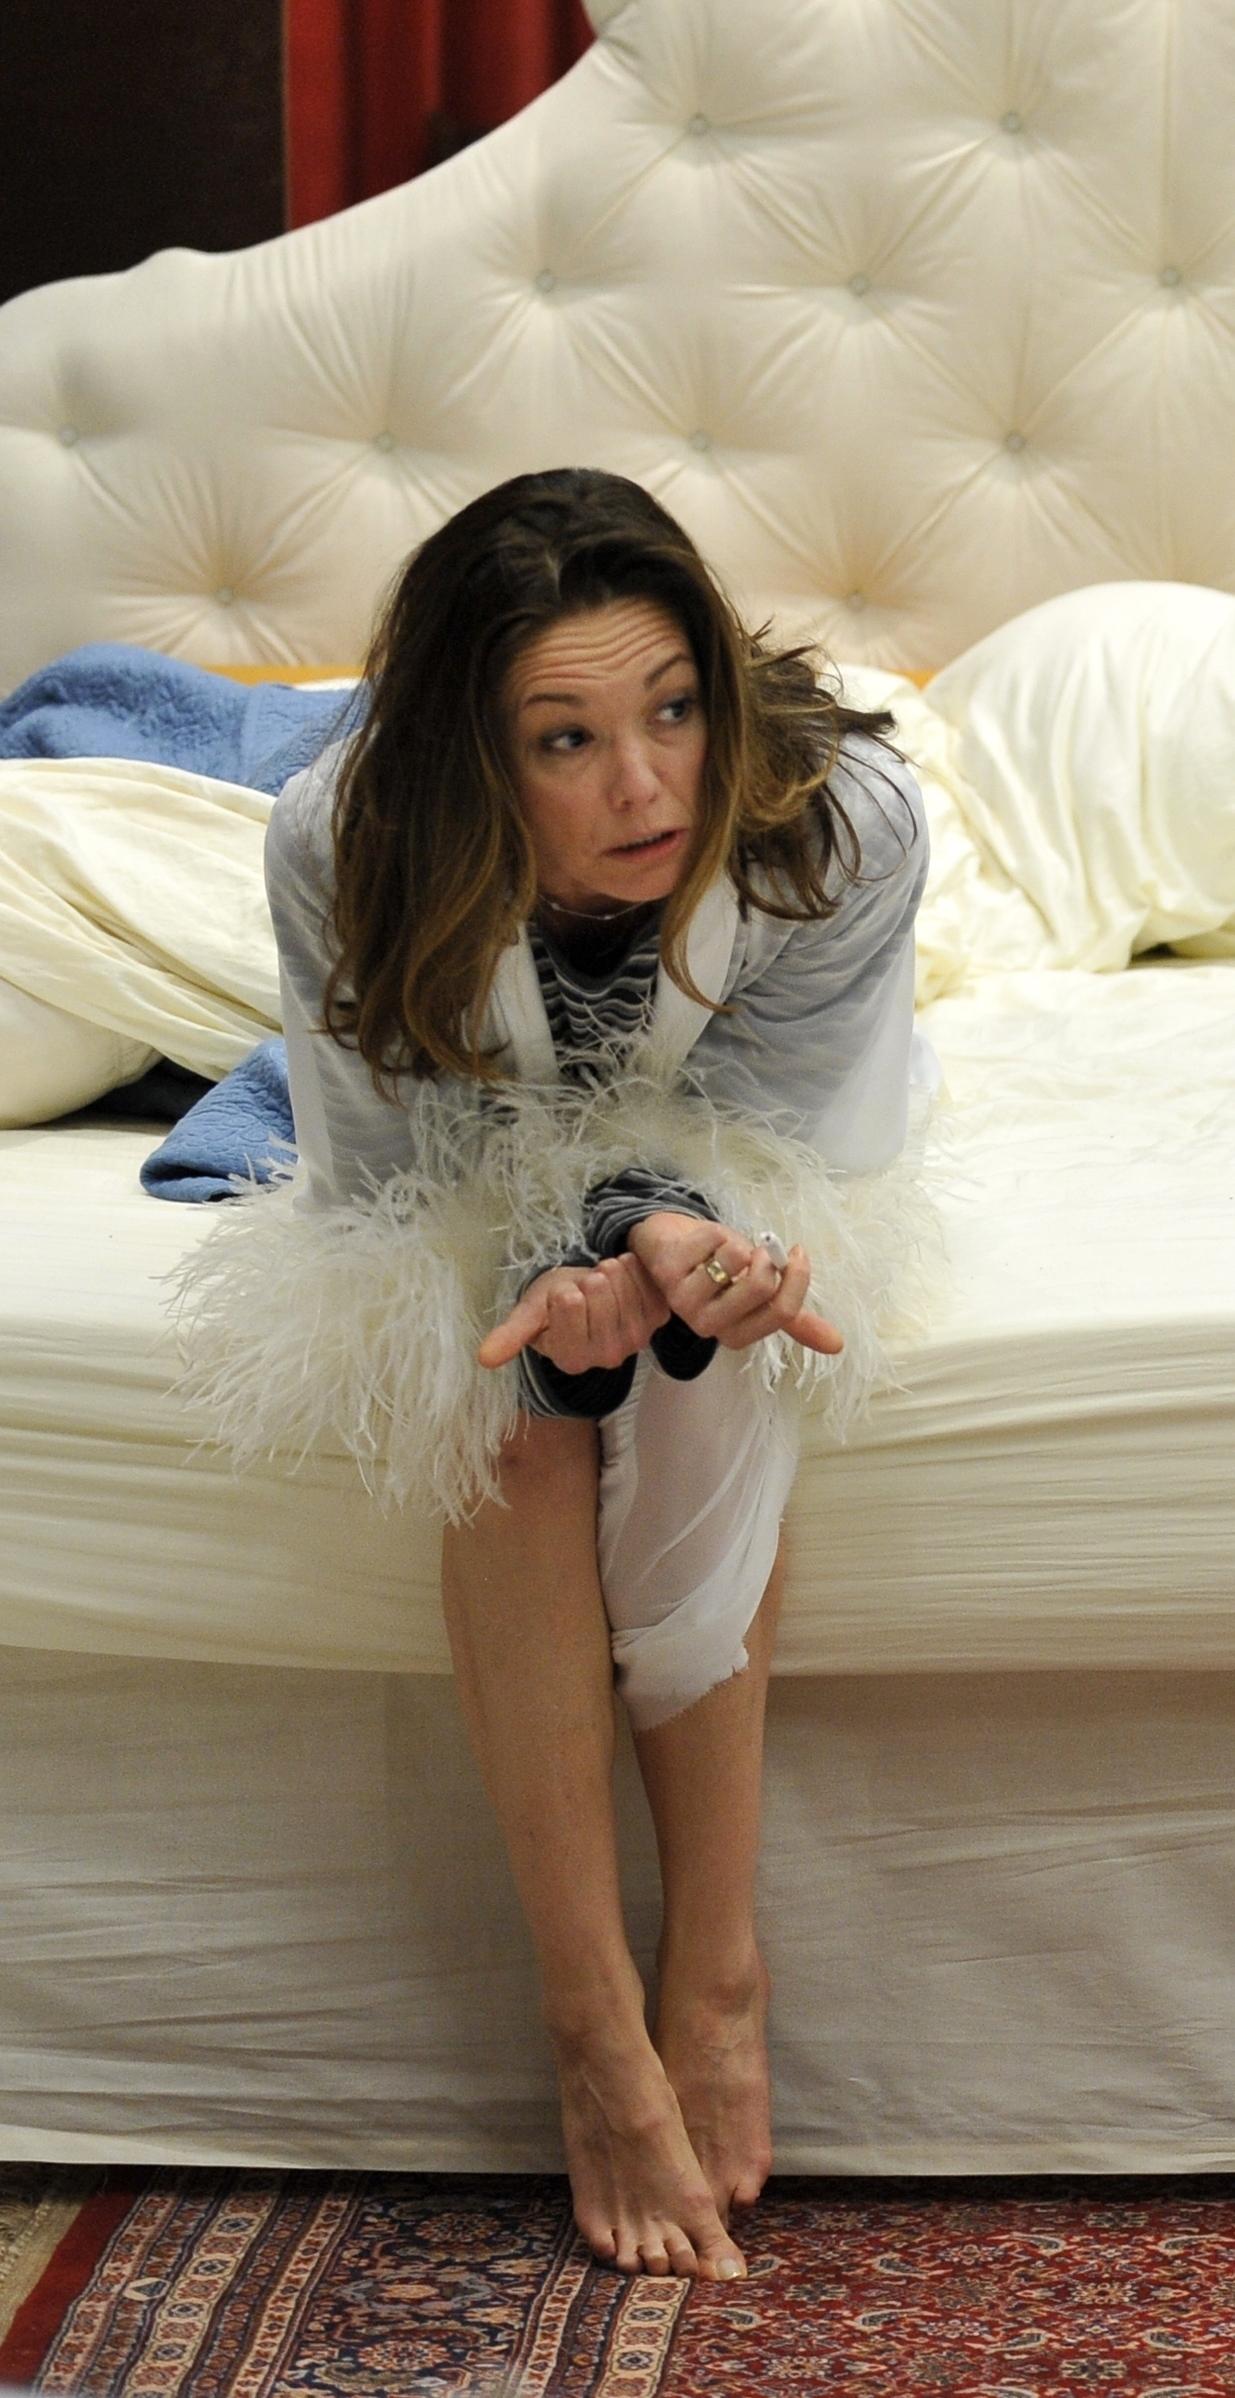 My Celebrity: Diane Lane Feet